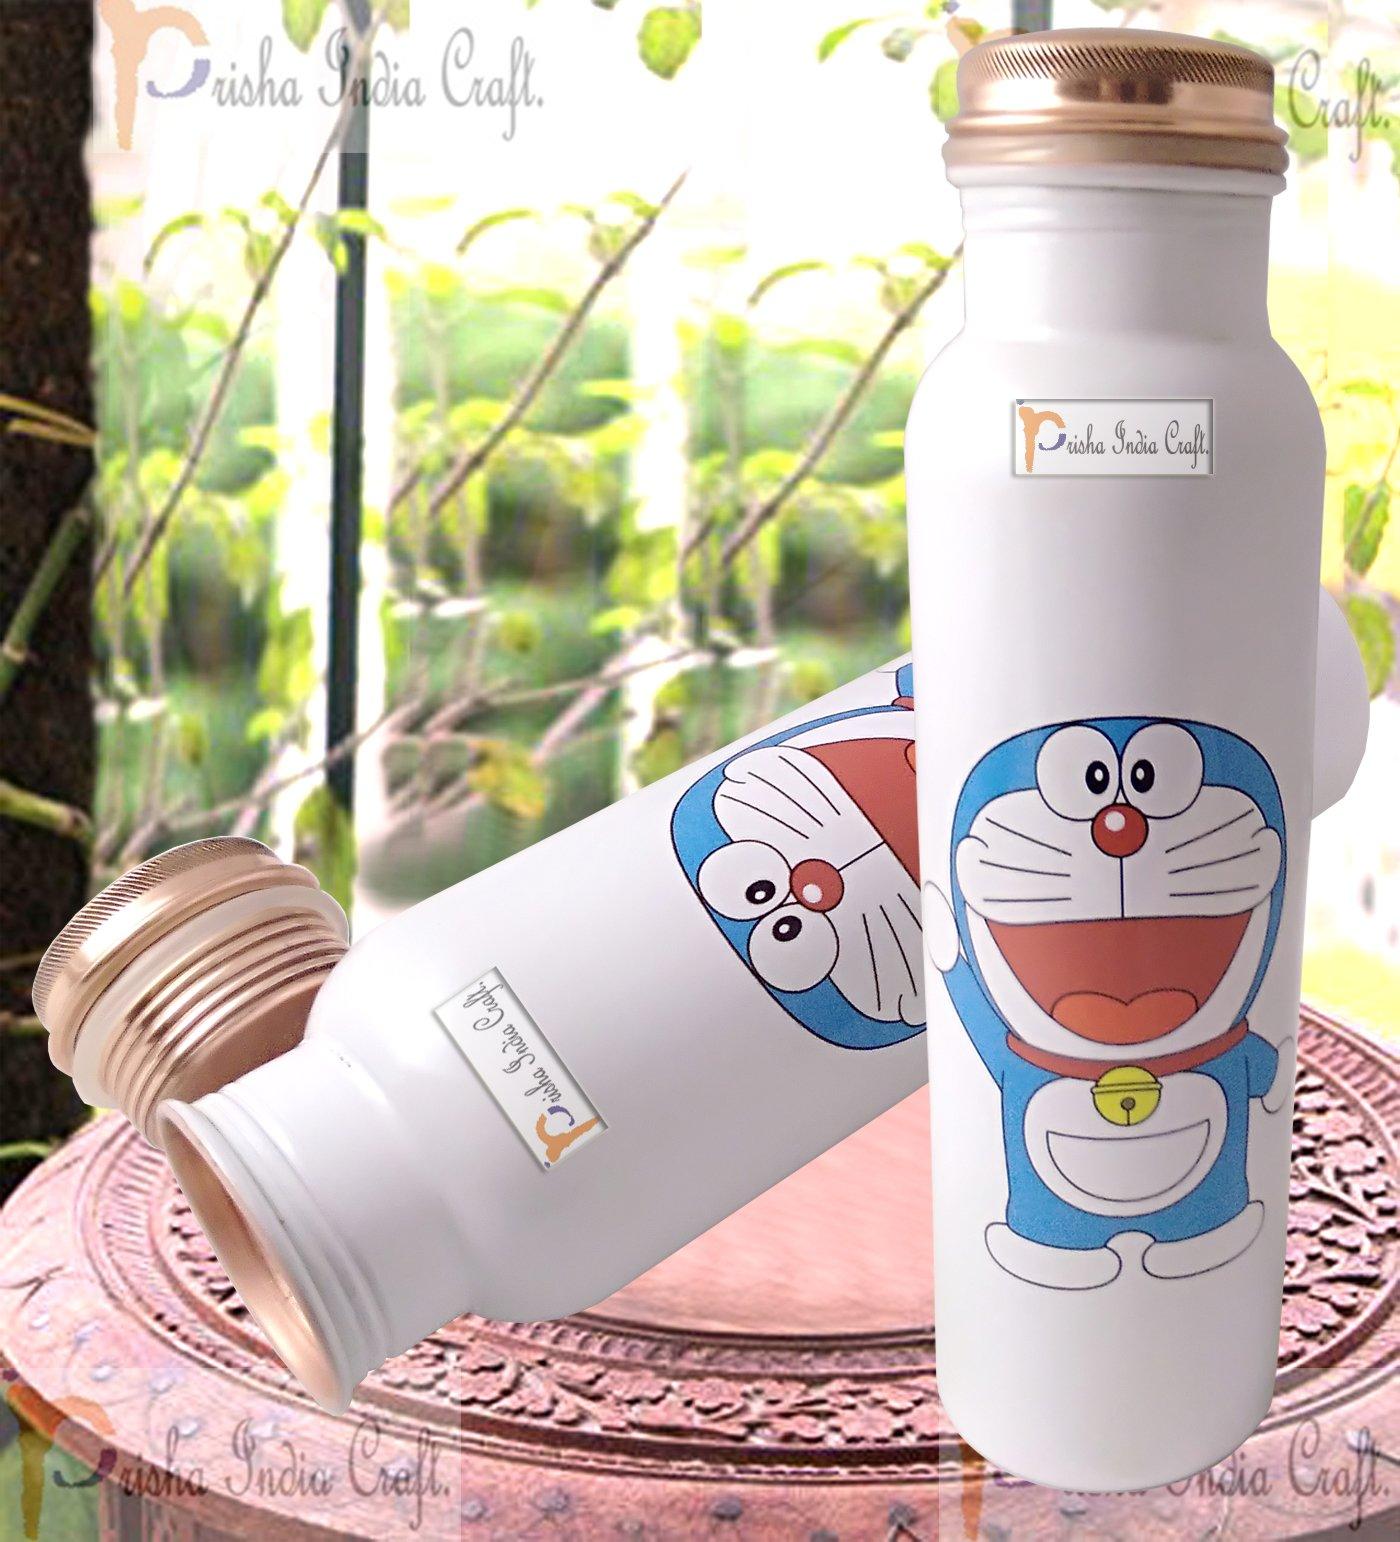 Prisha India Craft Digital Printed Pure Copper Water Bottle Kids School Water Bottle - Doremon Design, 1000 ML  Set of 2